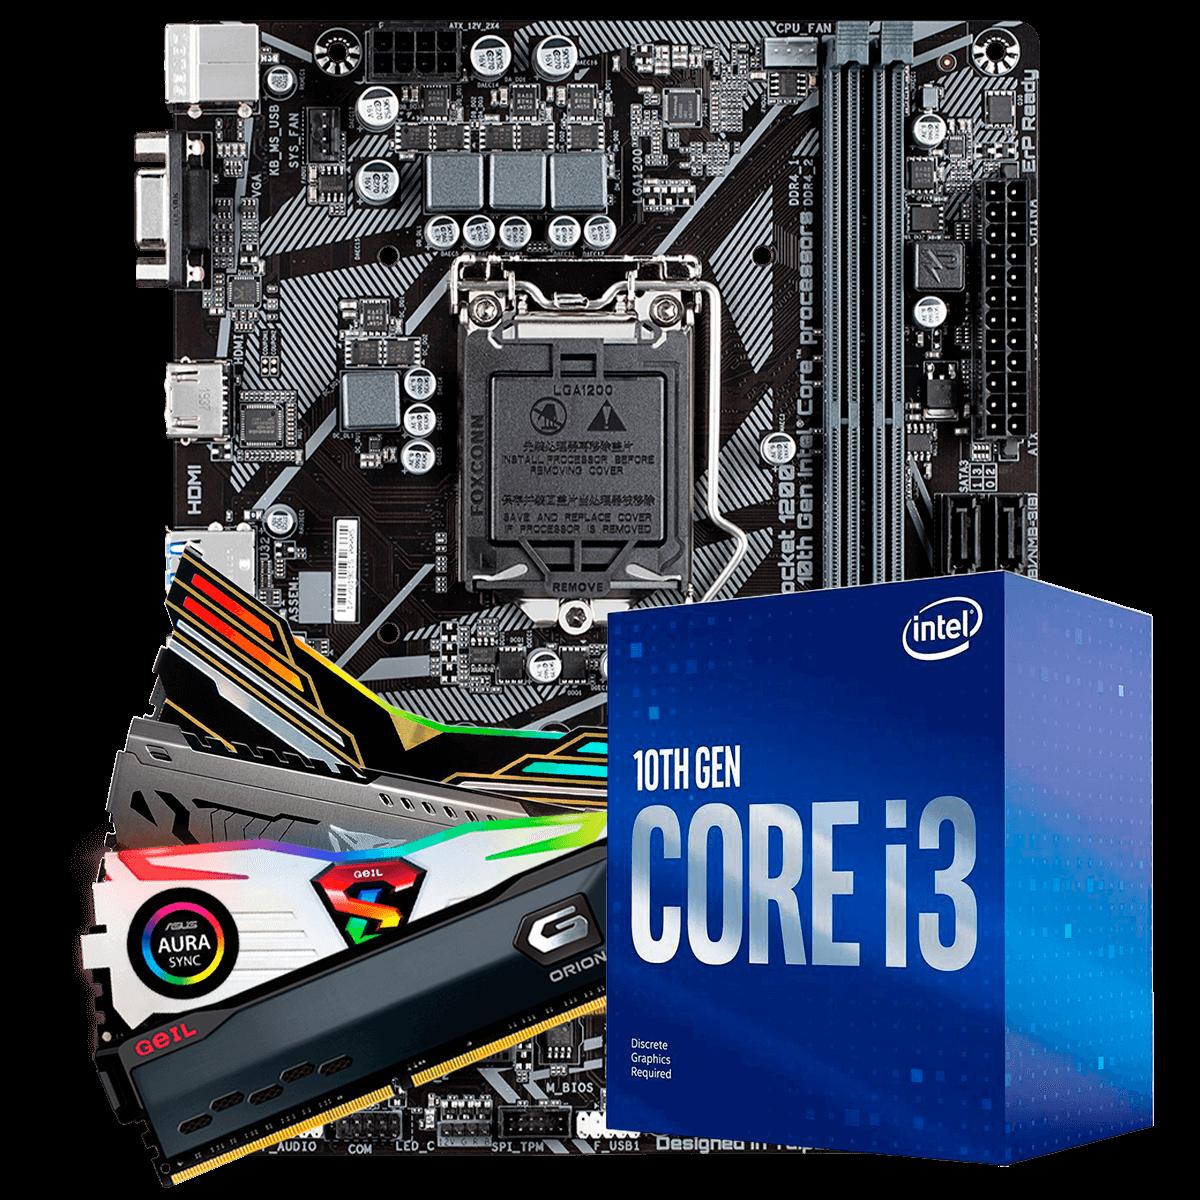 Kit Upgrade, Intel Core i3 10100, Gigabyte H410M-H, Memória 8GB DDR4 3000Mhz